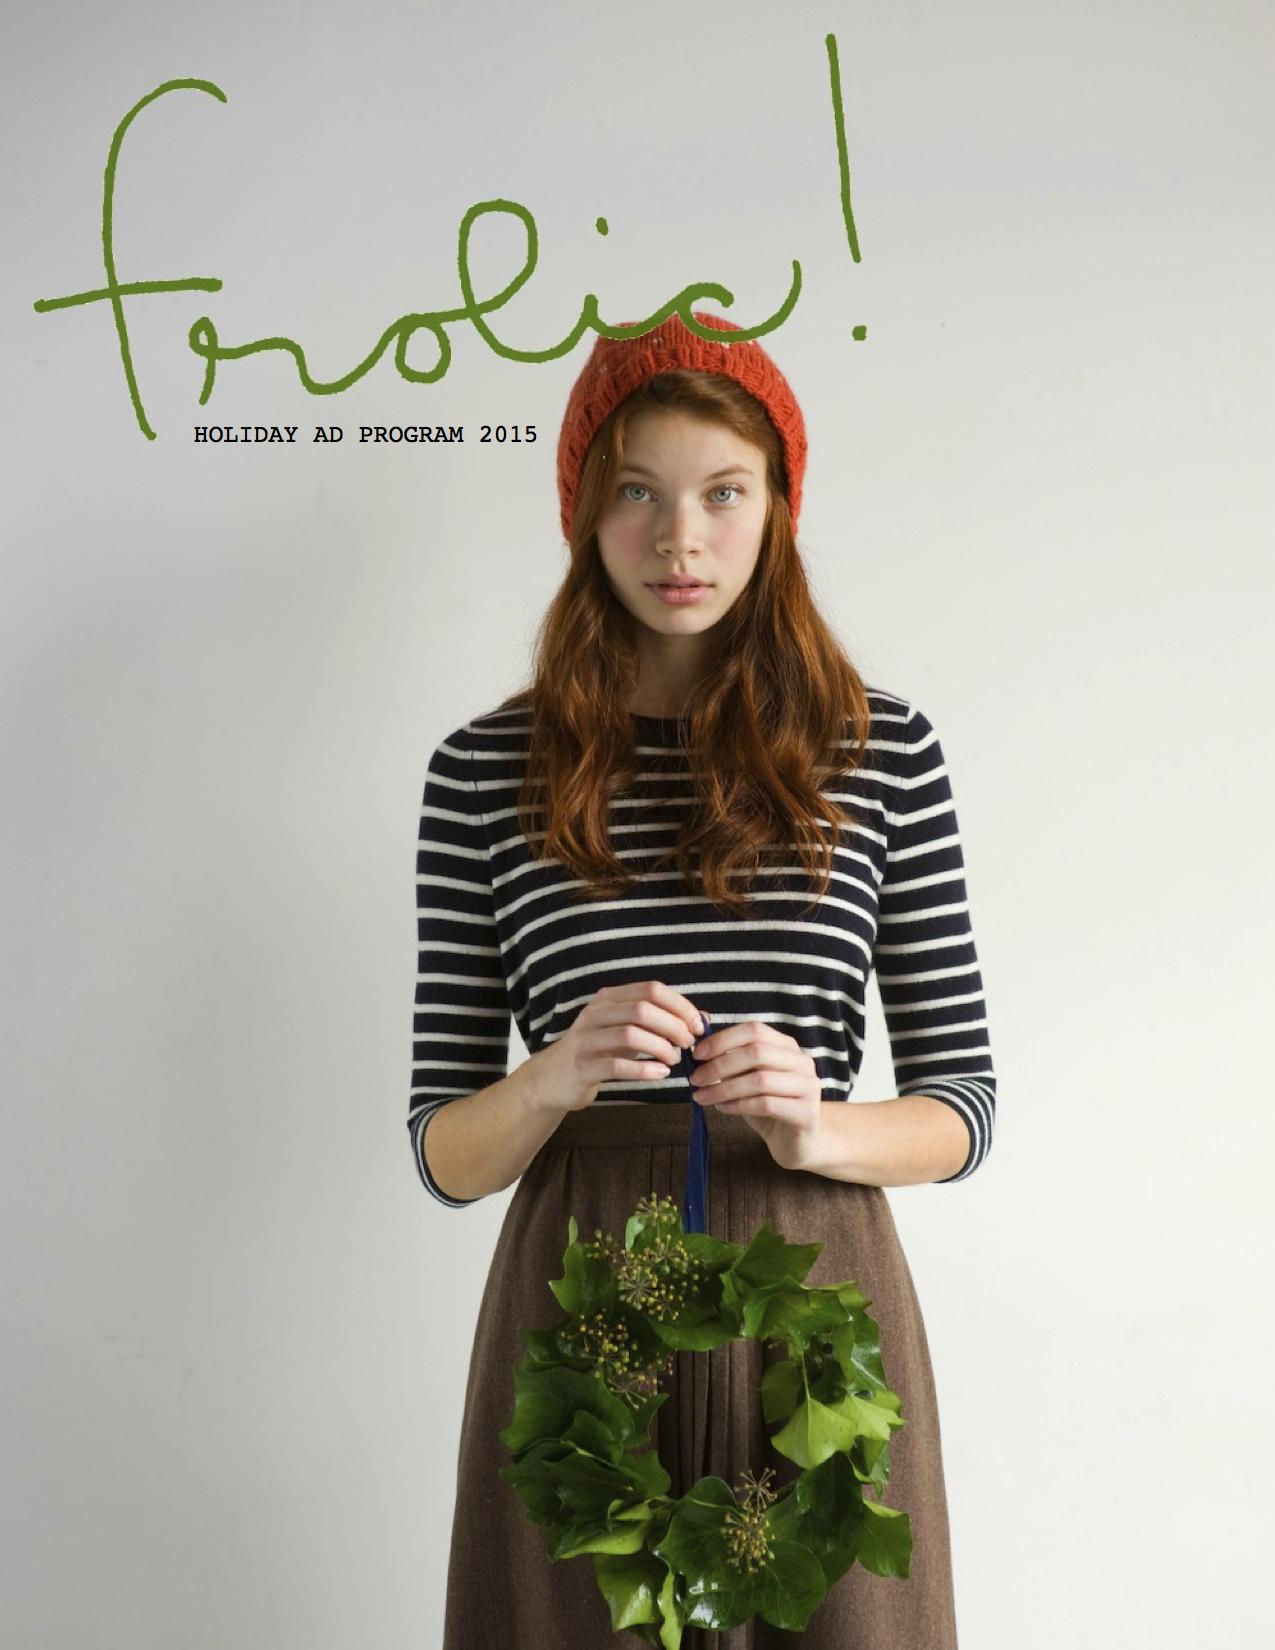 frolic-holiday-ad-program-2015